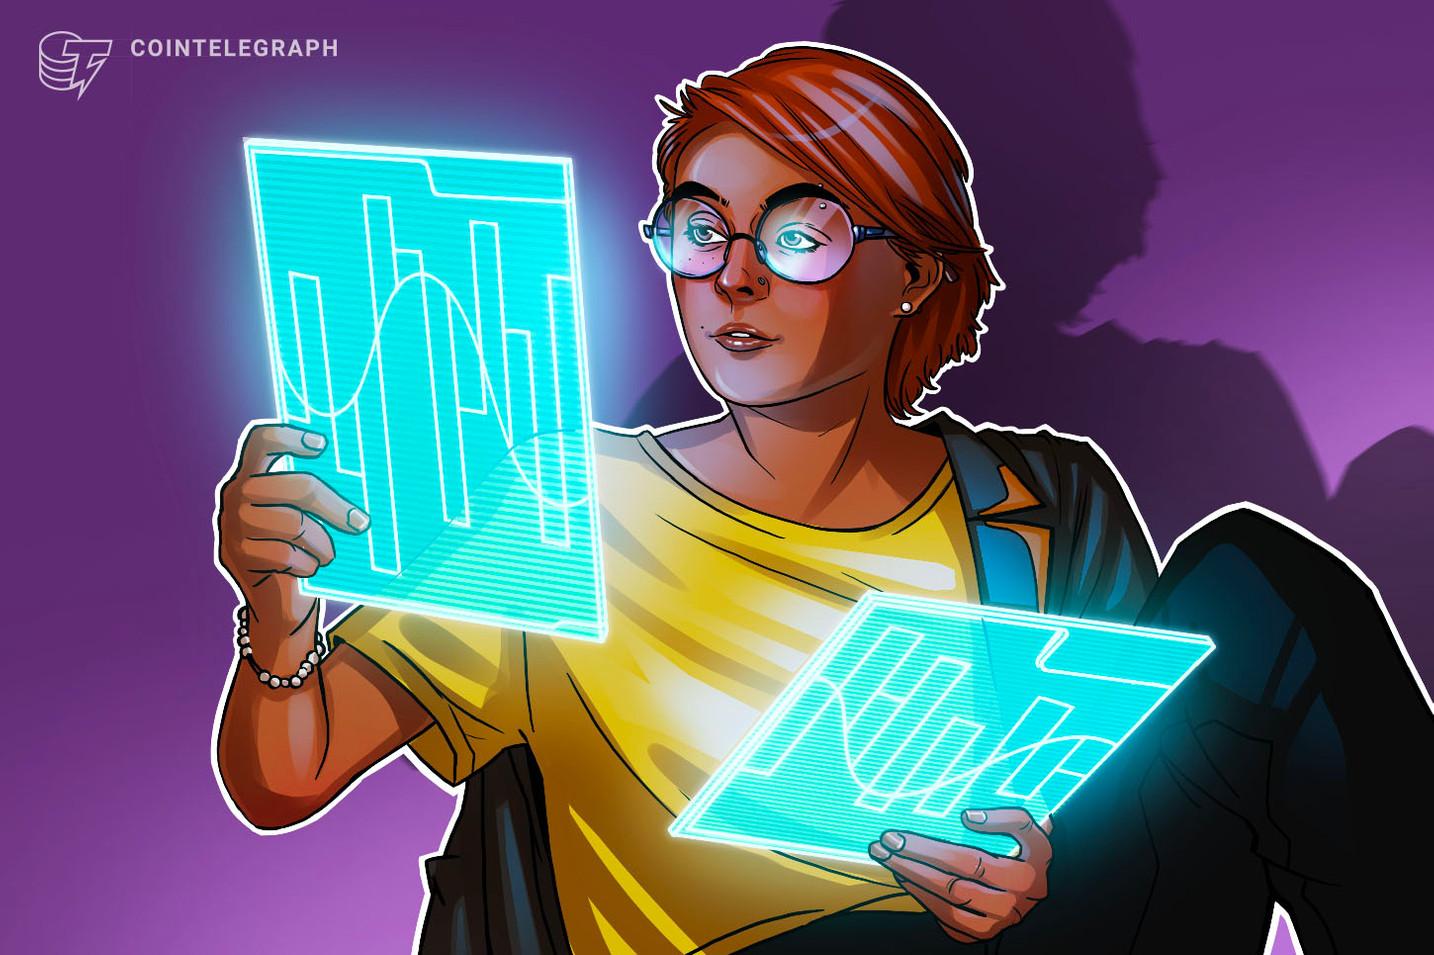 La capacidad de hashing de Riot Blockchain creció un 460% en 2020, revela un informe